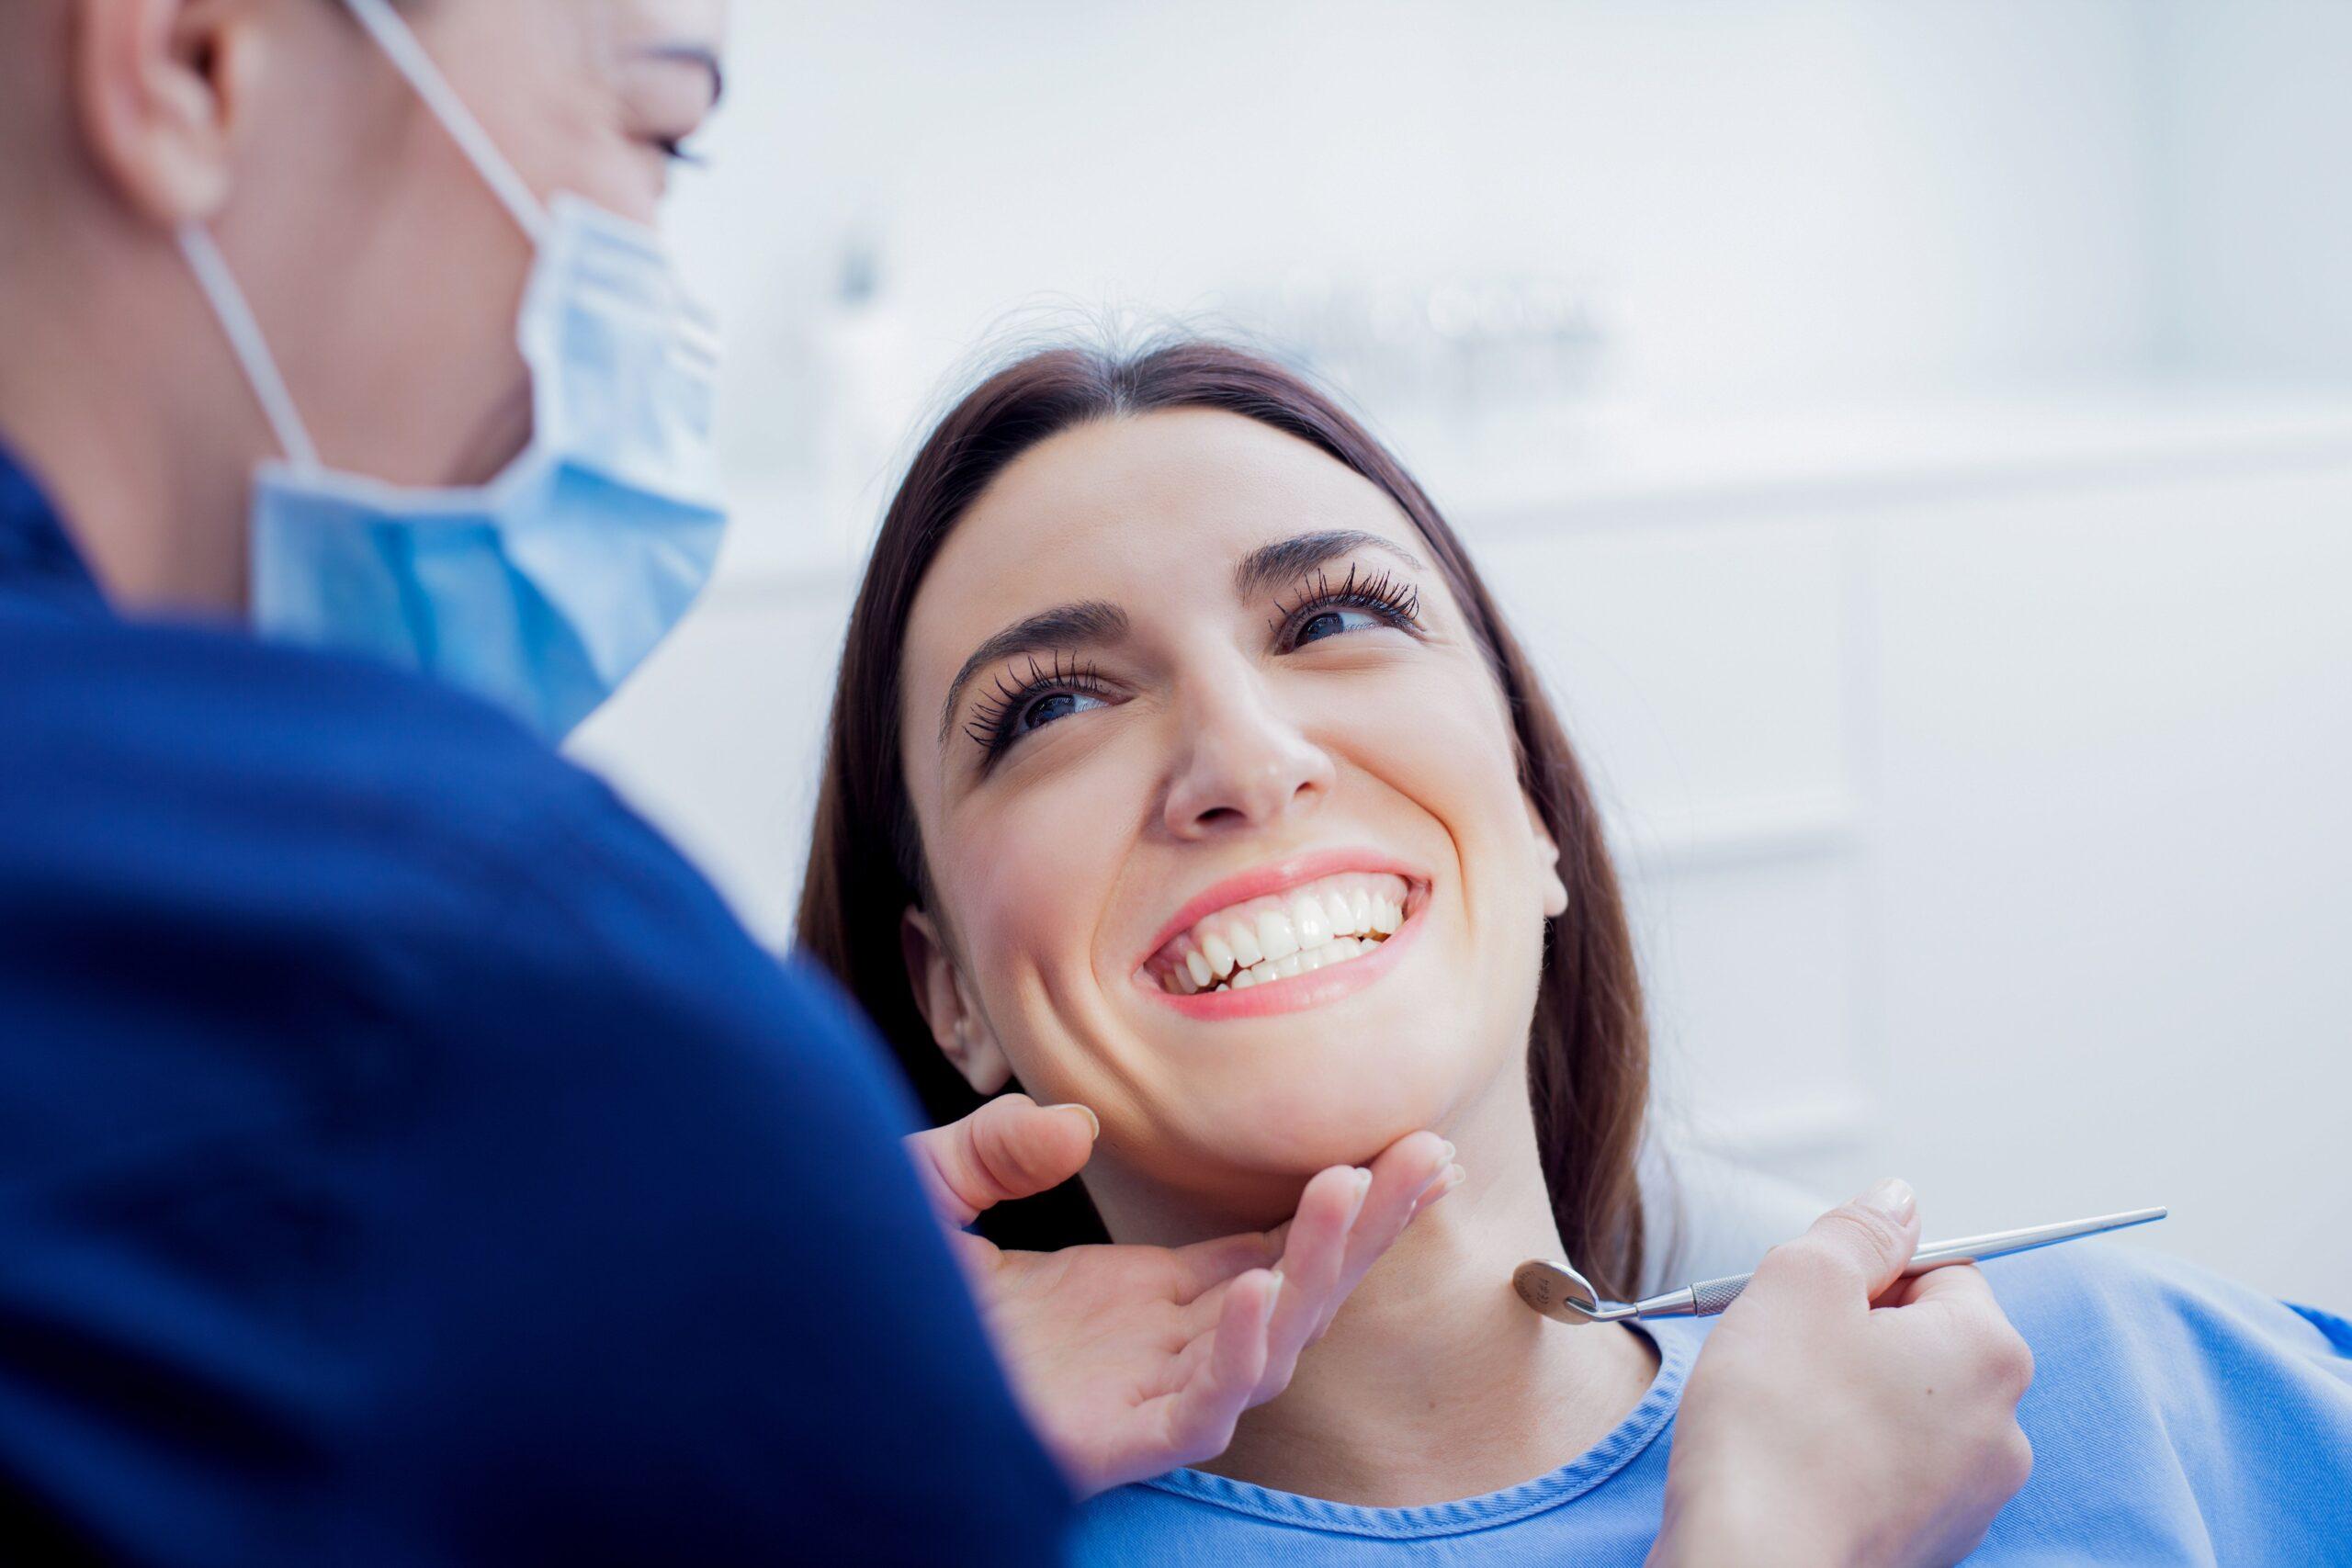 Hoffman Estates dentist